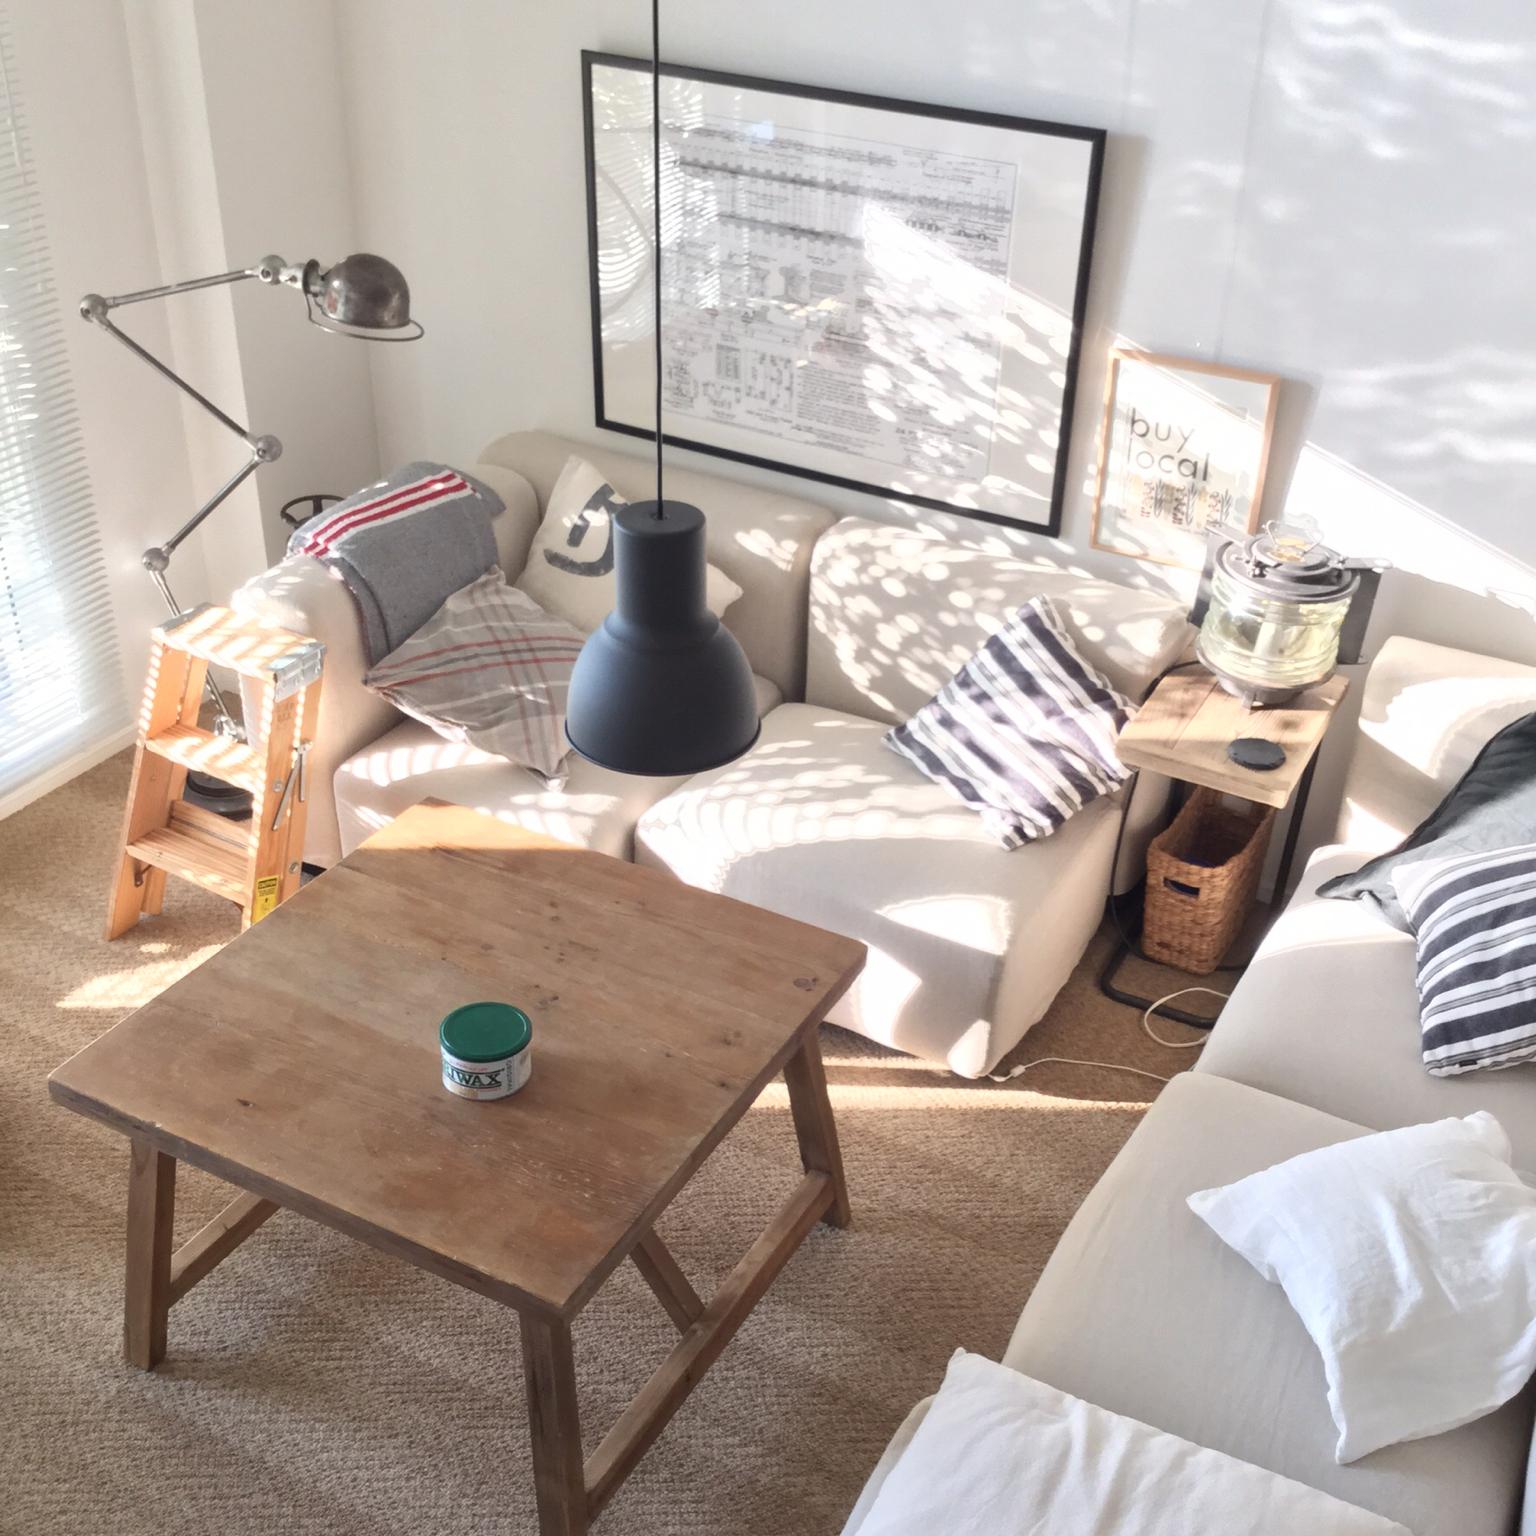 ikeaの絶対にチェックしたい家具15選 | roomclip mag | 暮らしと